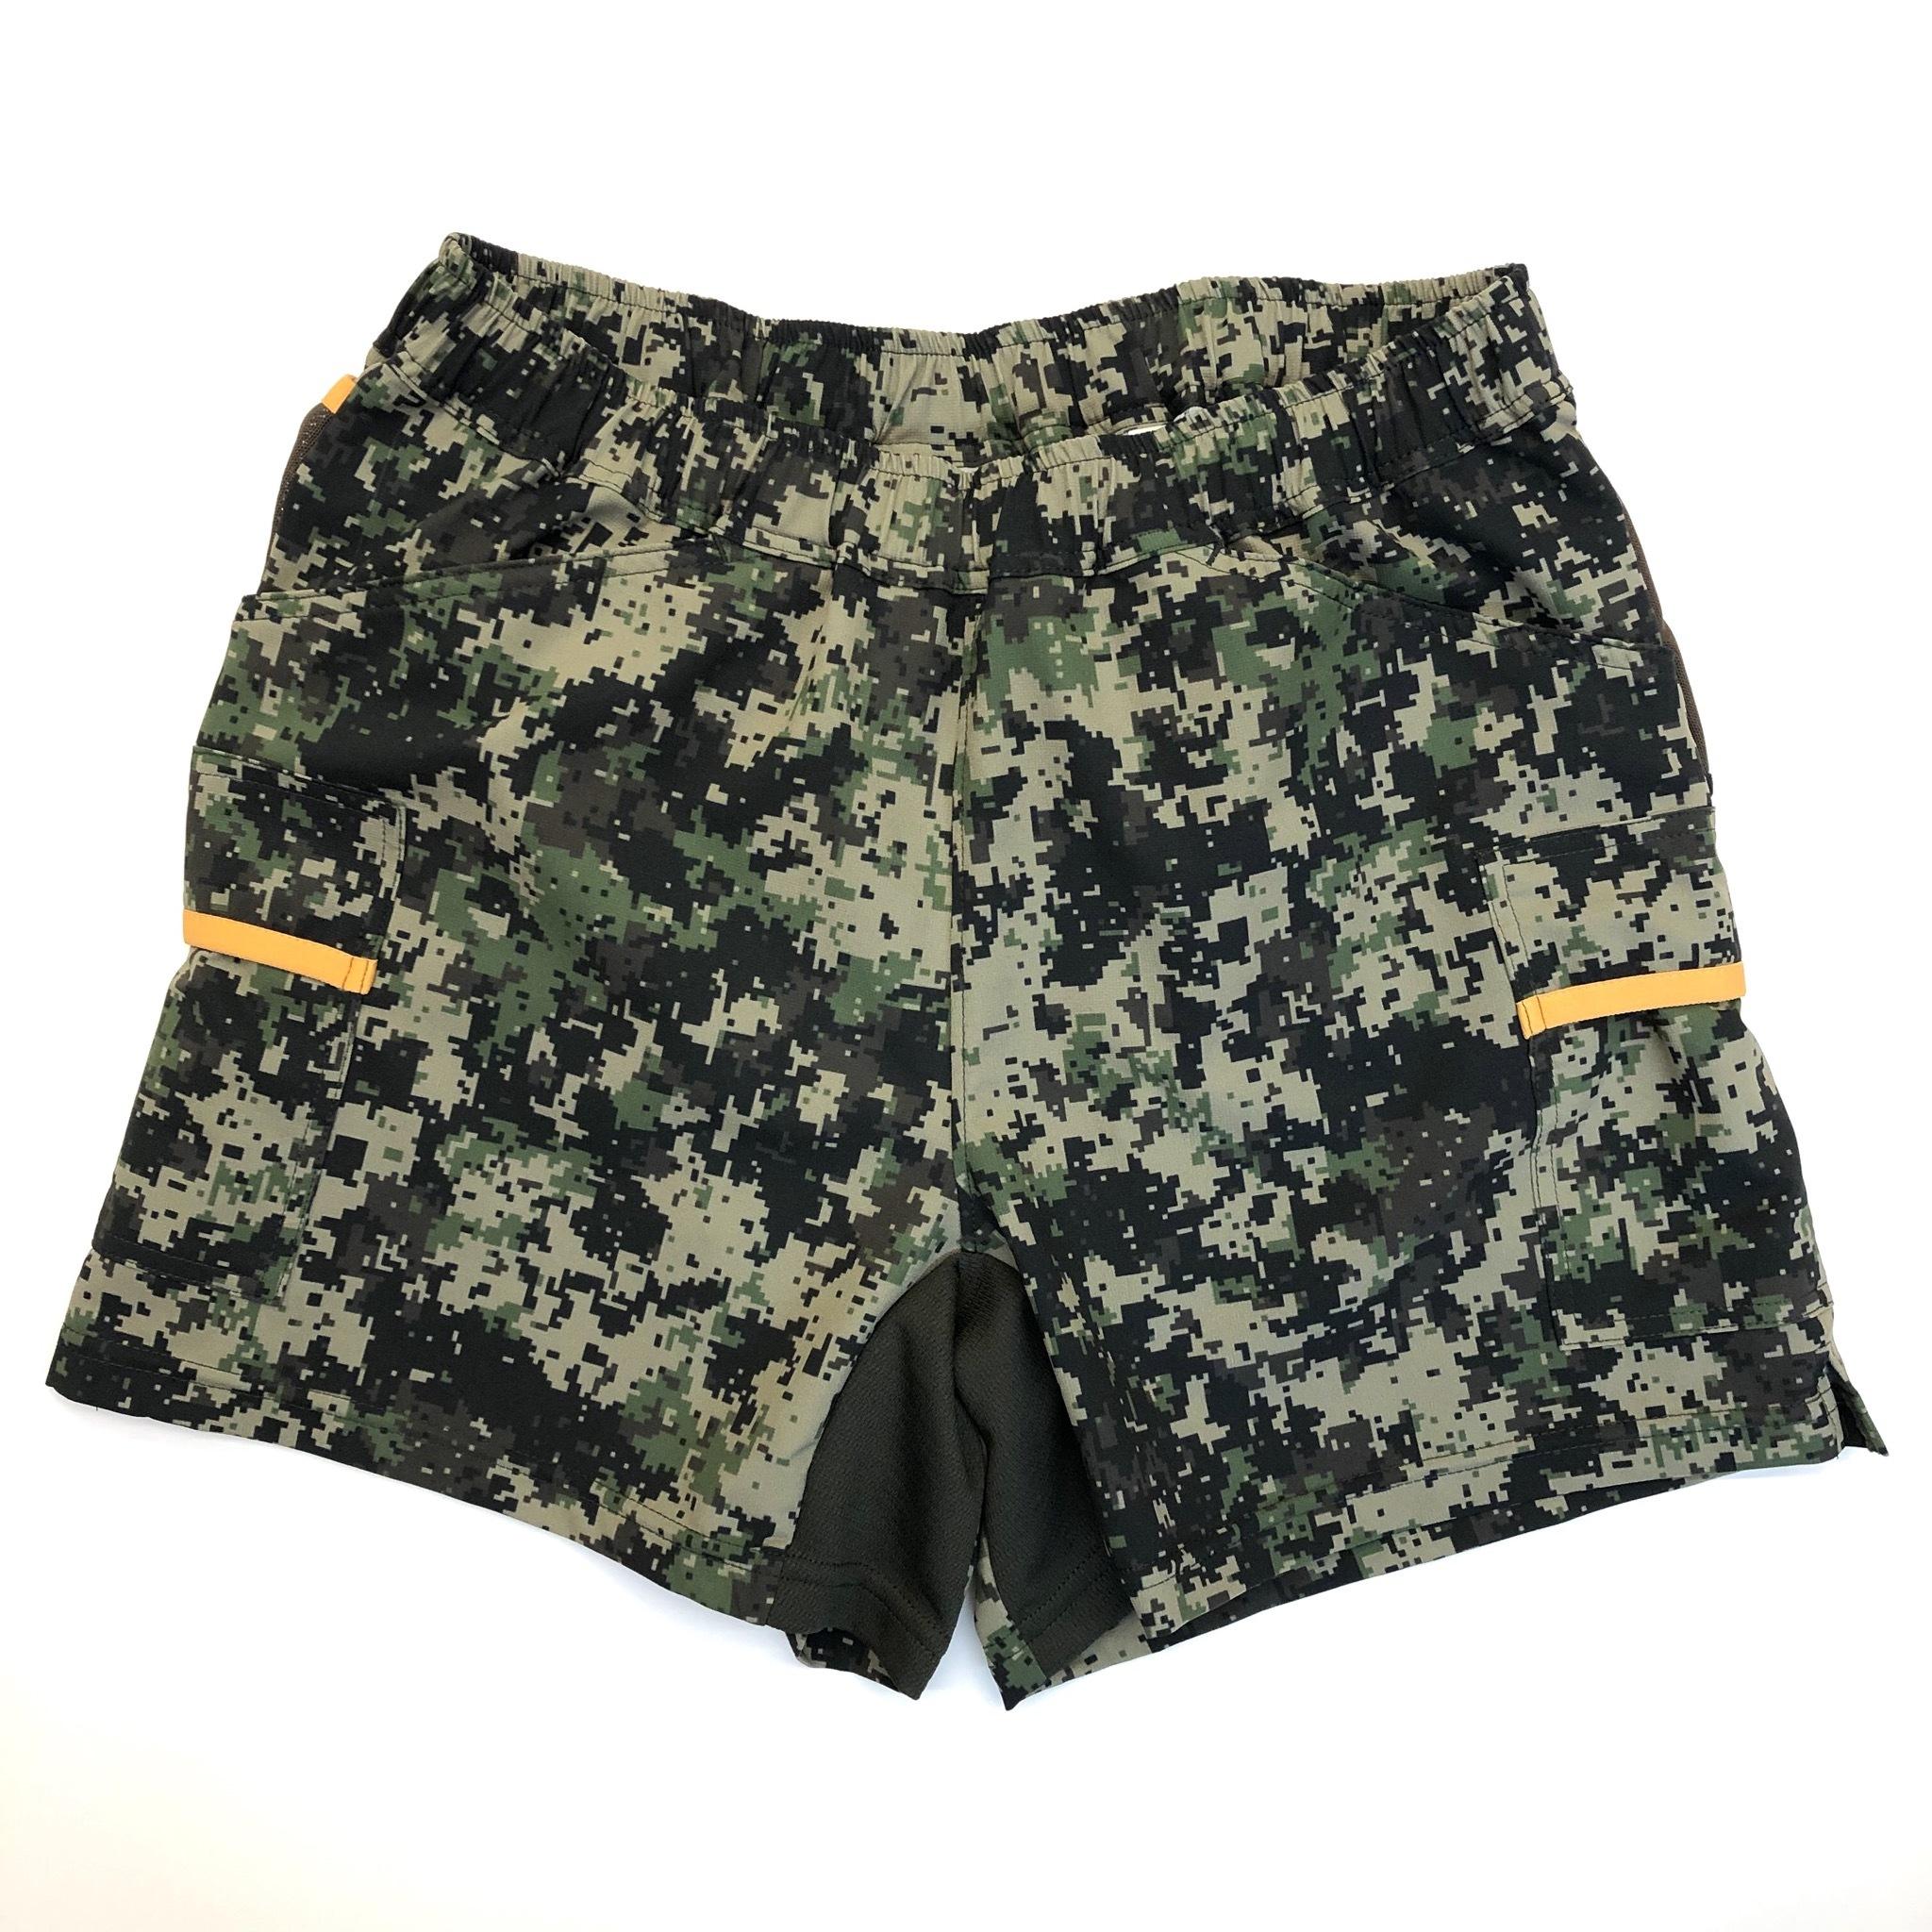 Mountain Martial Arts /MMA Women's 7pkt Shorts  《Digital Camo》